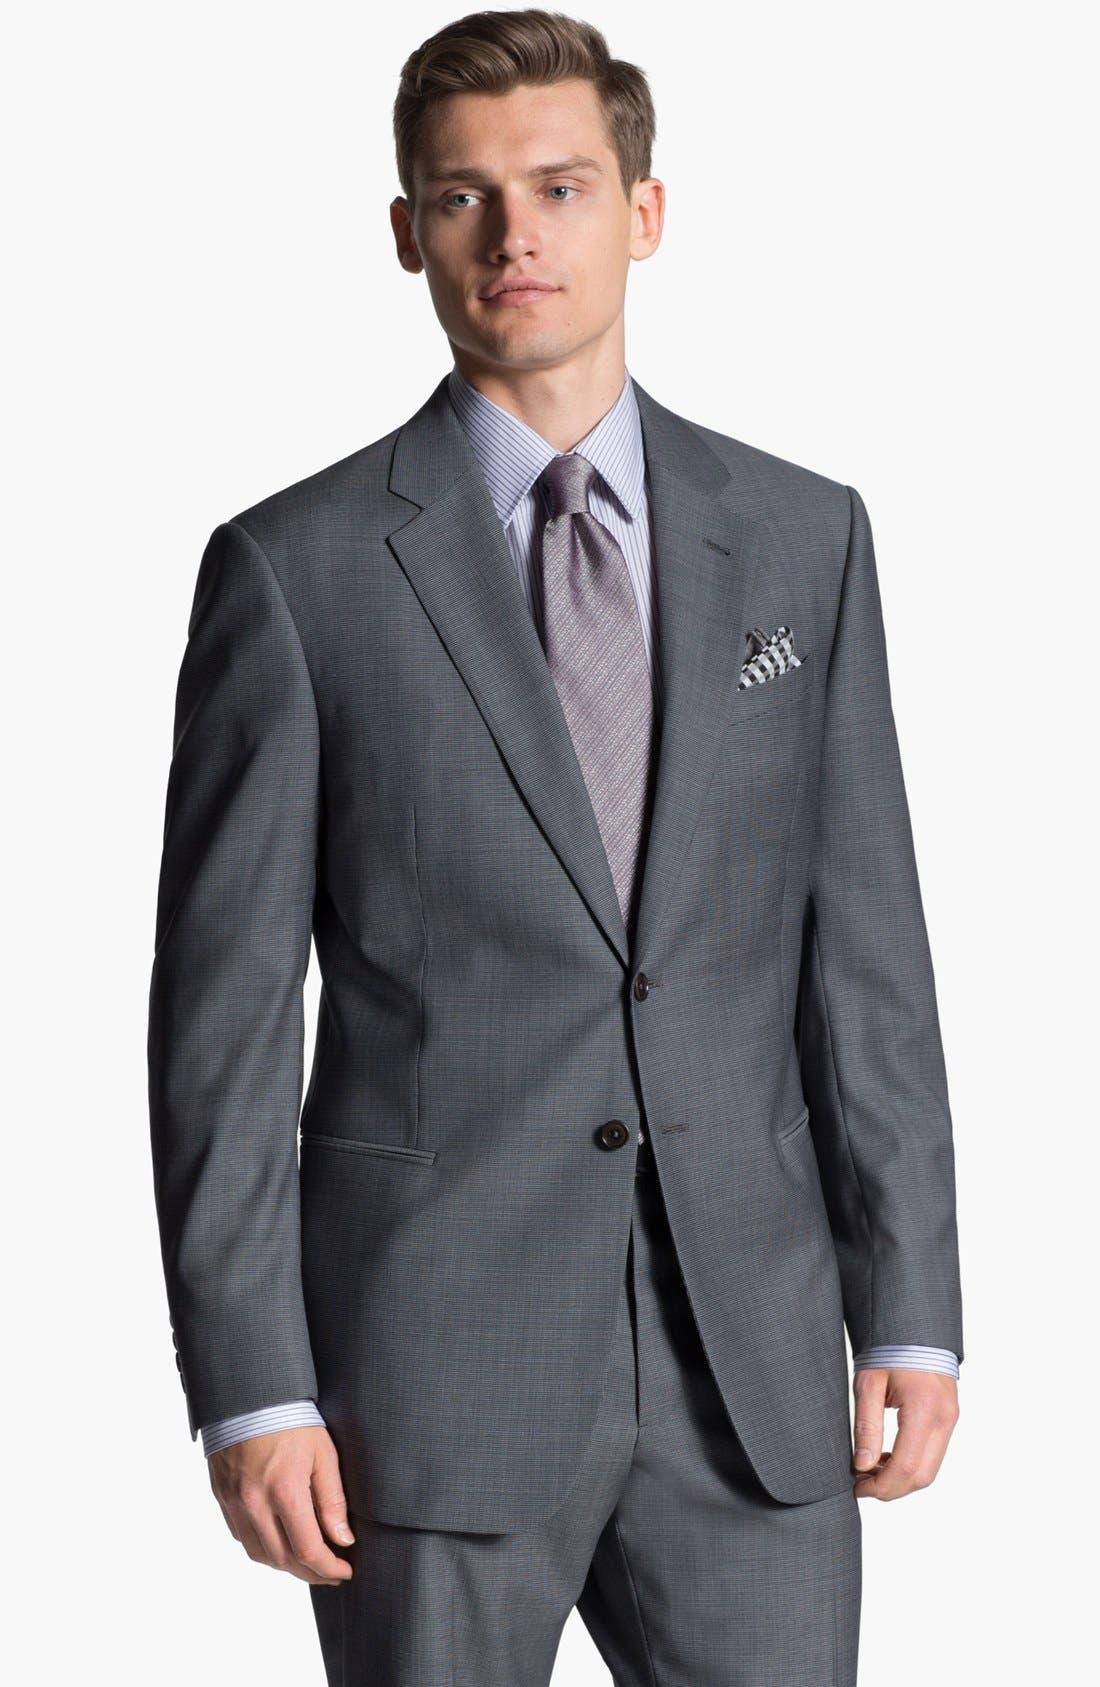 Alternate Image 1 Selected - Armani Collezioni 'Giorgio' Tic Weave Wool Suit